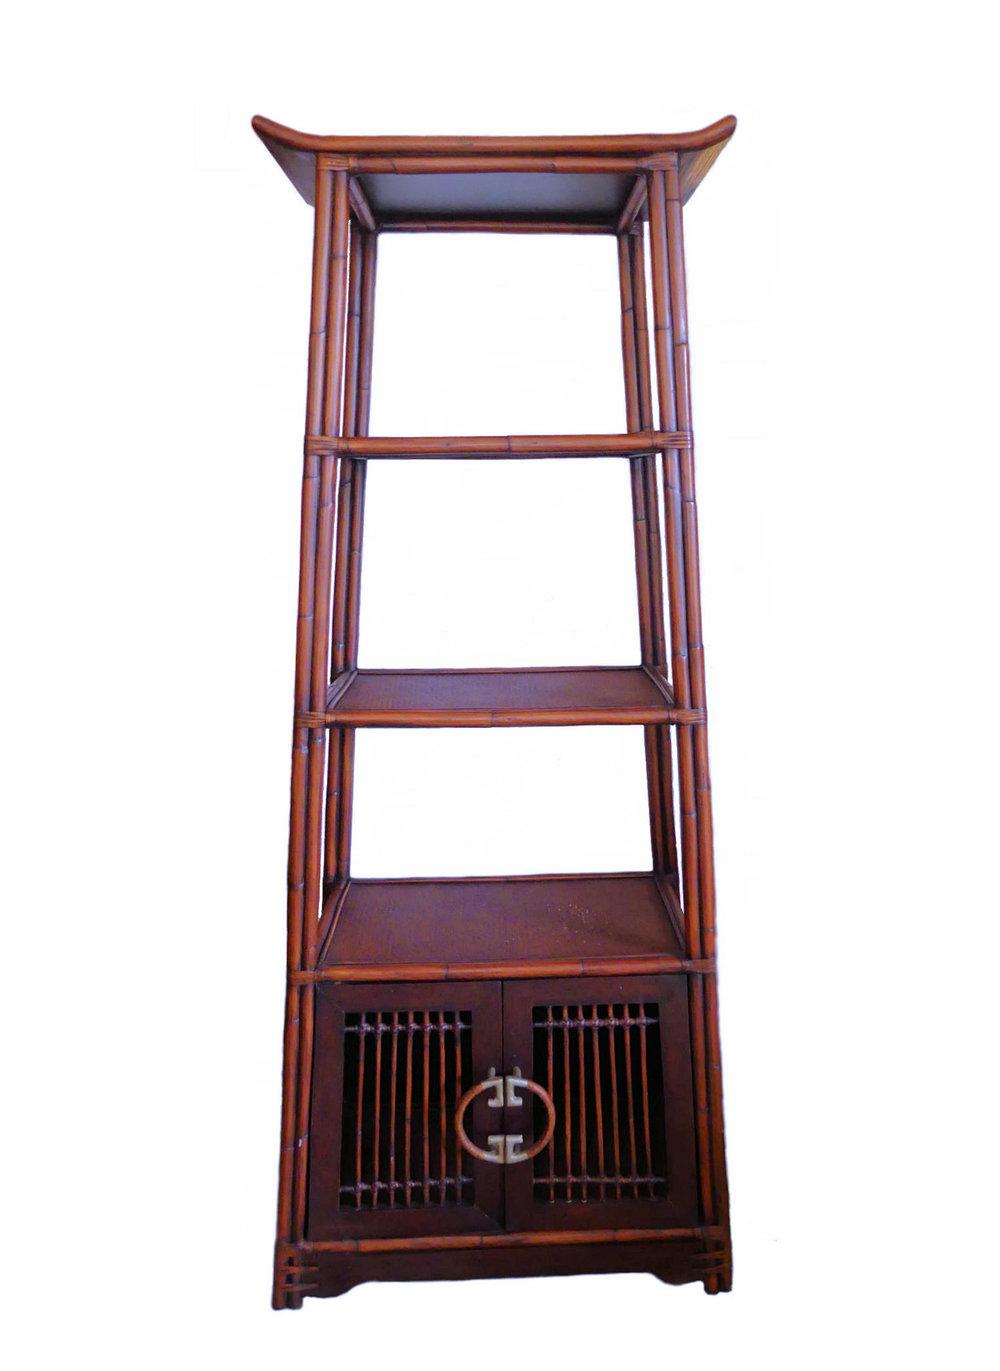 SOLD Palecek Asian Ming Style Bamboo & Rattan Etagere